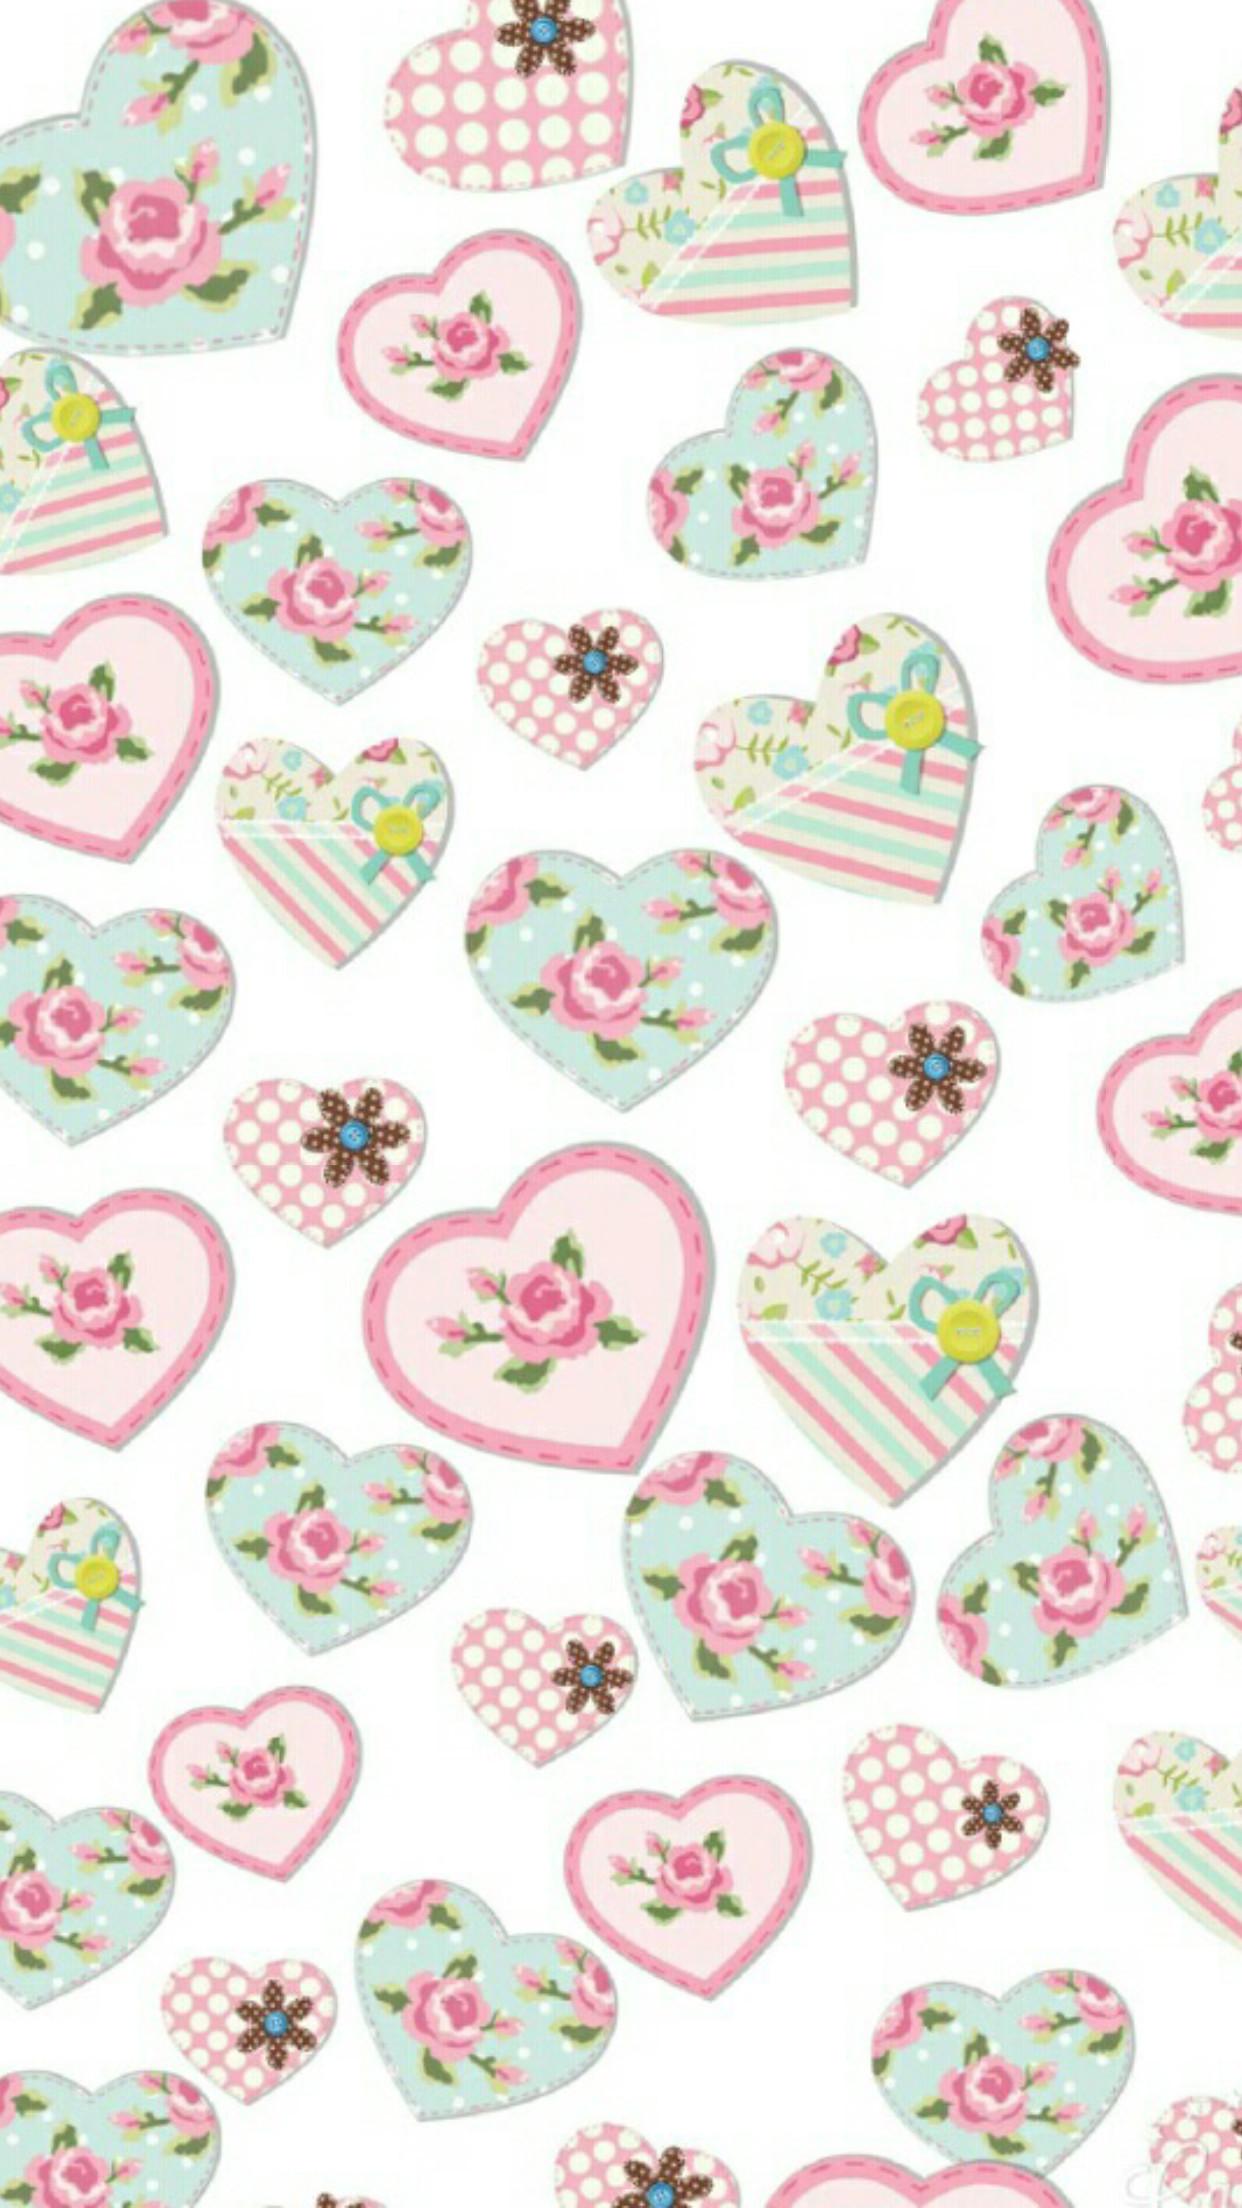 Cute Love Wallpaper Cute Wallpapers Mobile All Wallpapers - Flower - HD Wallpaper